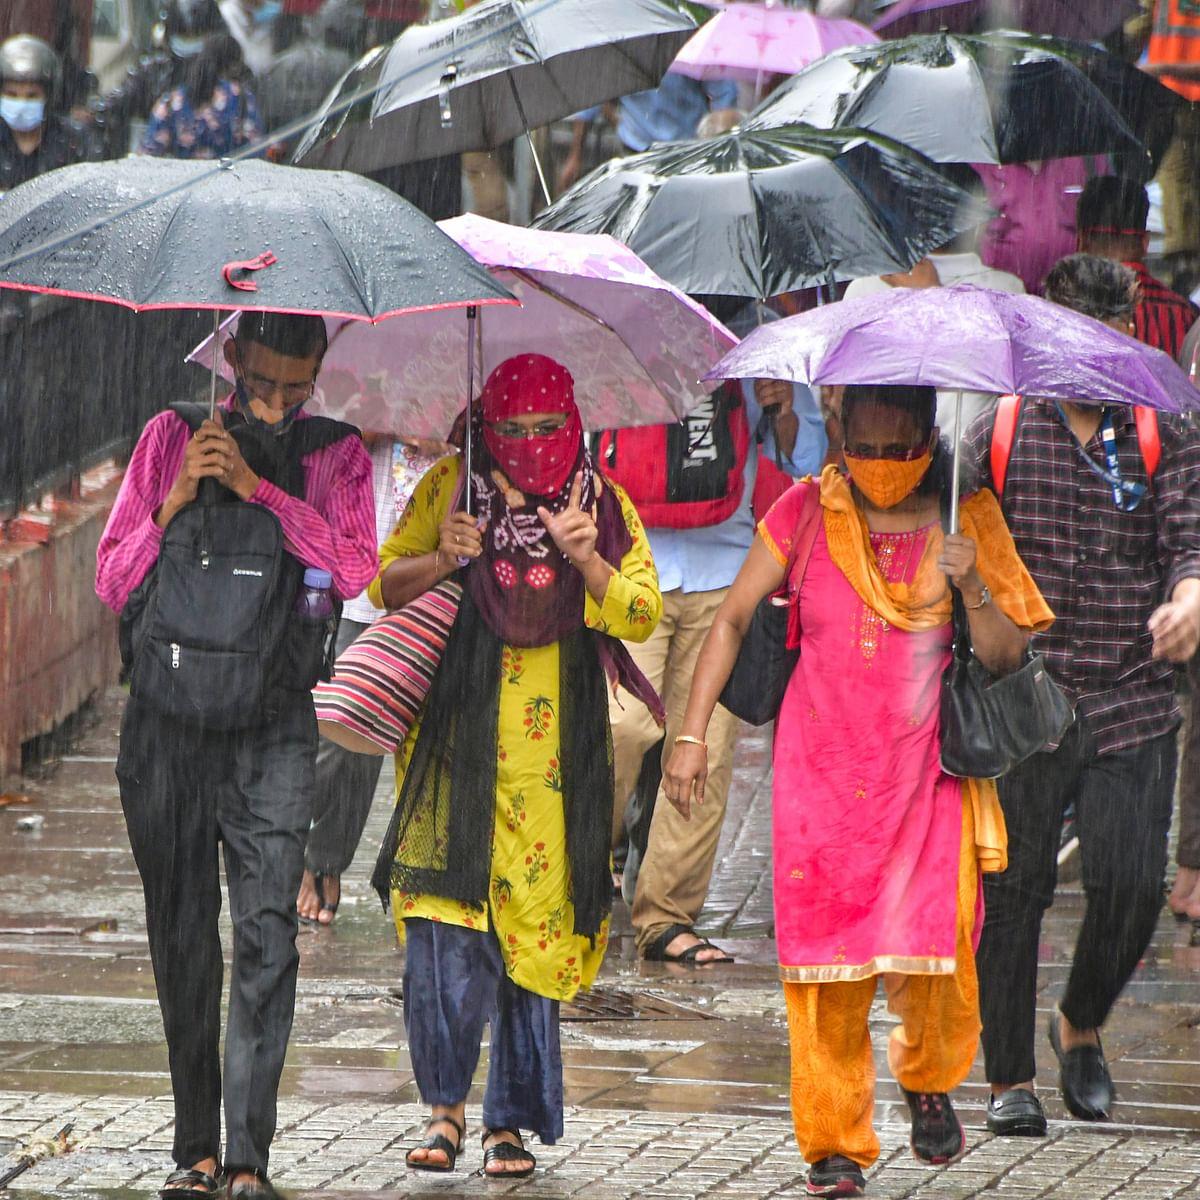 Mumbai Rains: Train services between CSMT-Kurla suspended after heavy rain lashes city